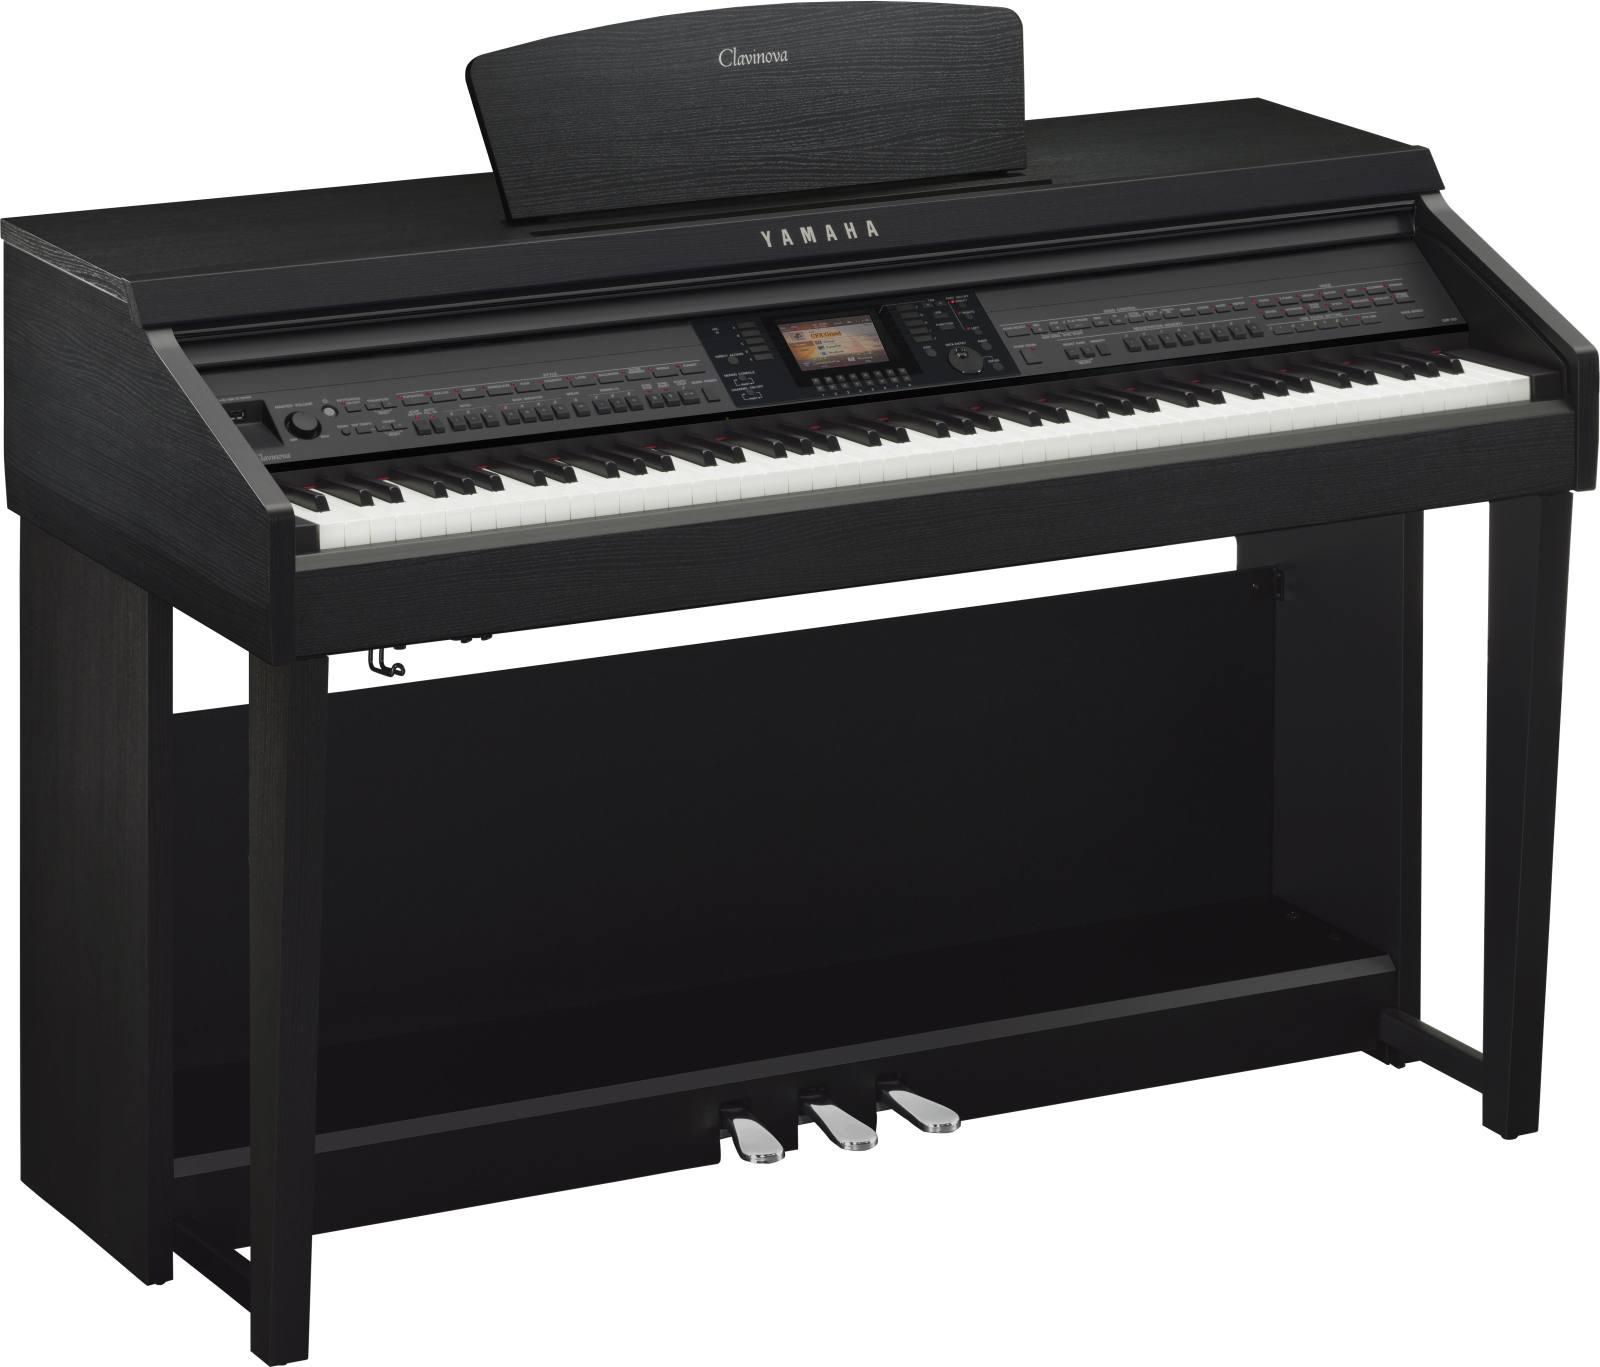 Yamaha clavinova cvp 701 noyer noir piano buy online for Yamaha clavinova clp 200 price